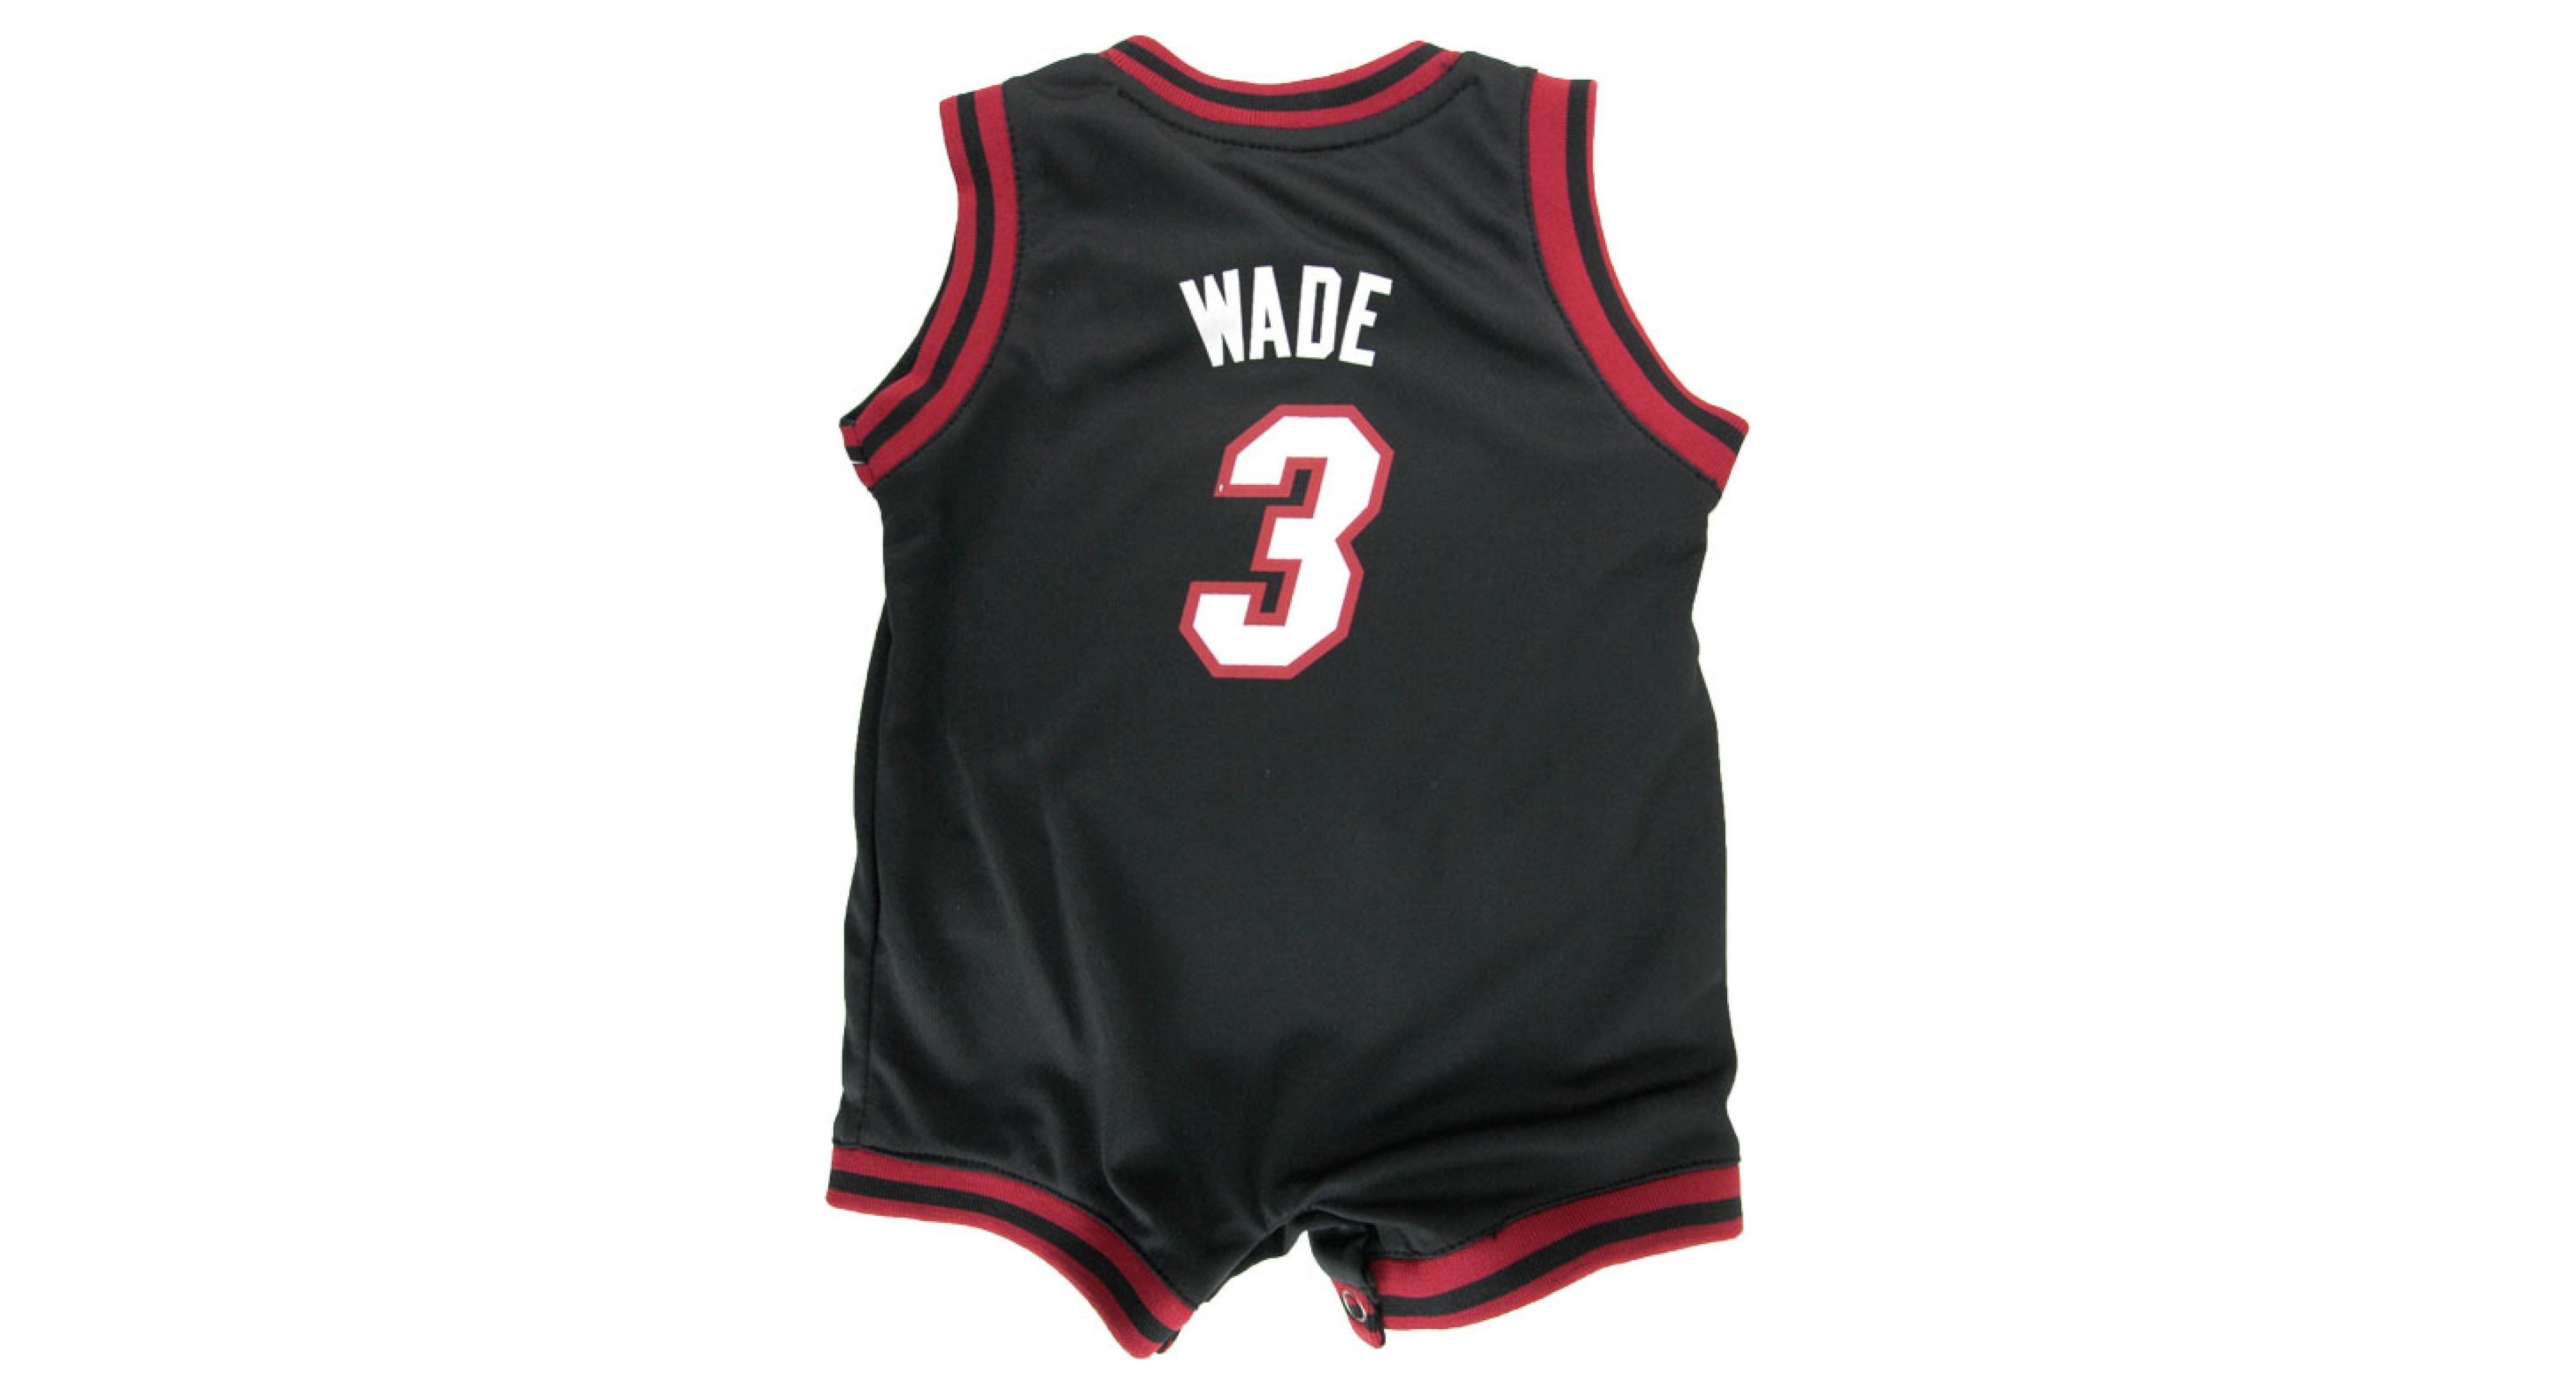 brand new f4452 194b0 adidas Baby Dwyane Wade Miami Heat Jersey | Products ...